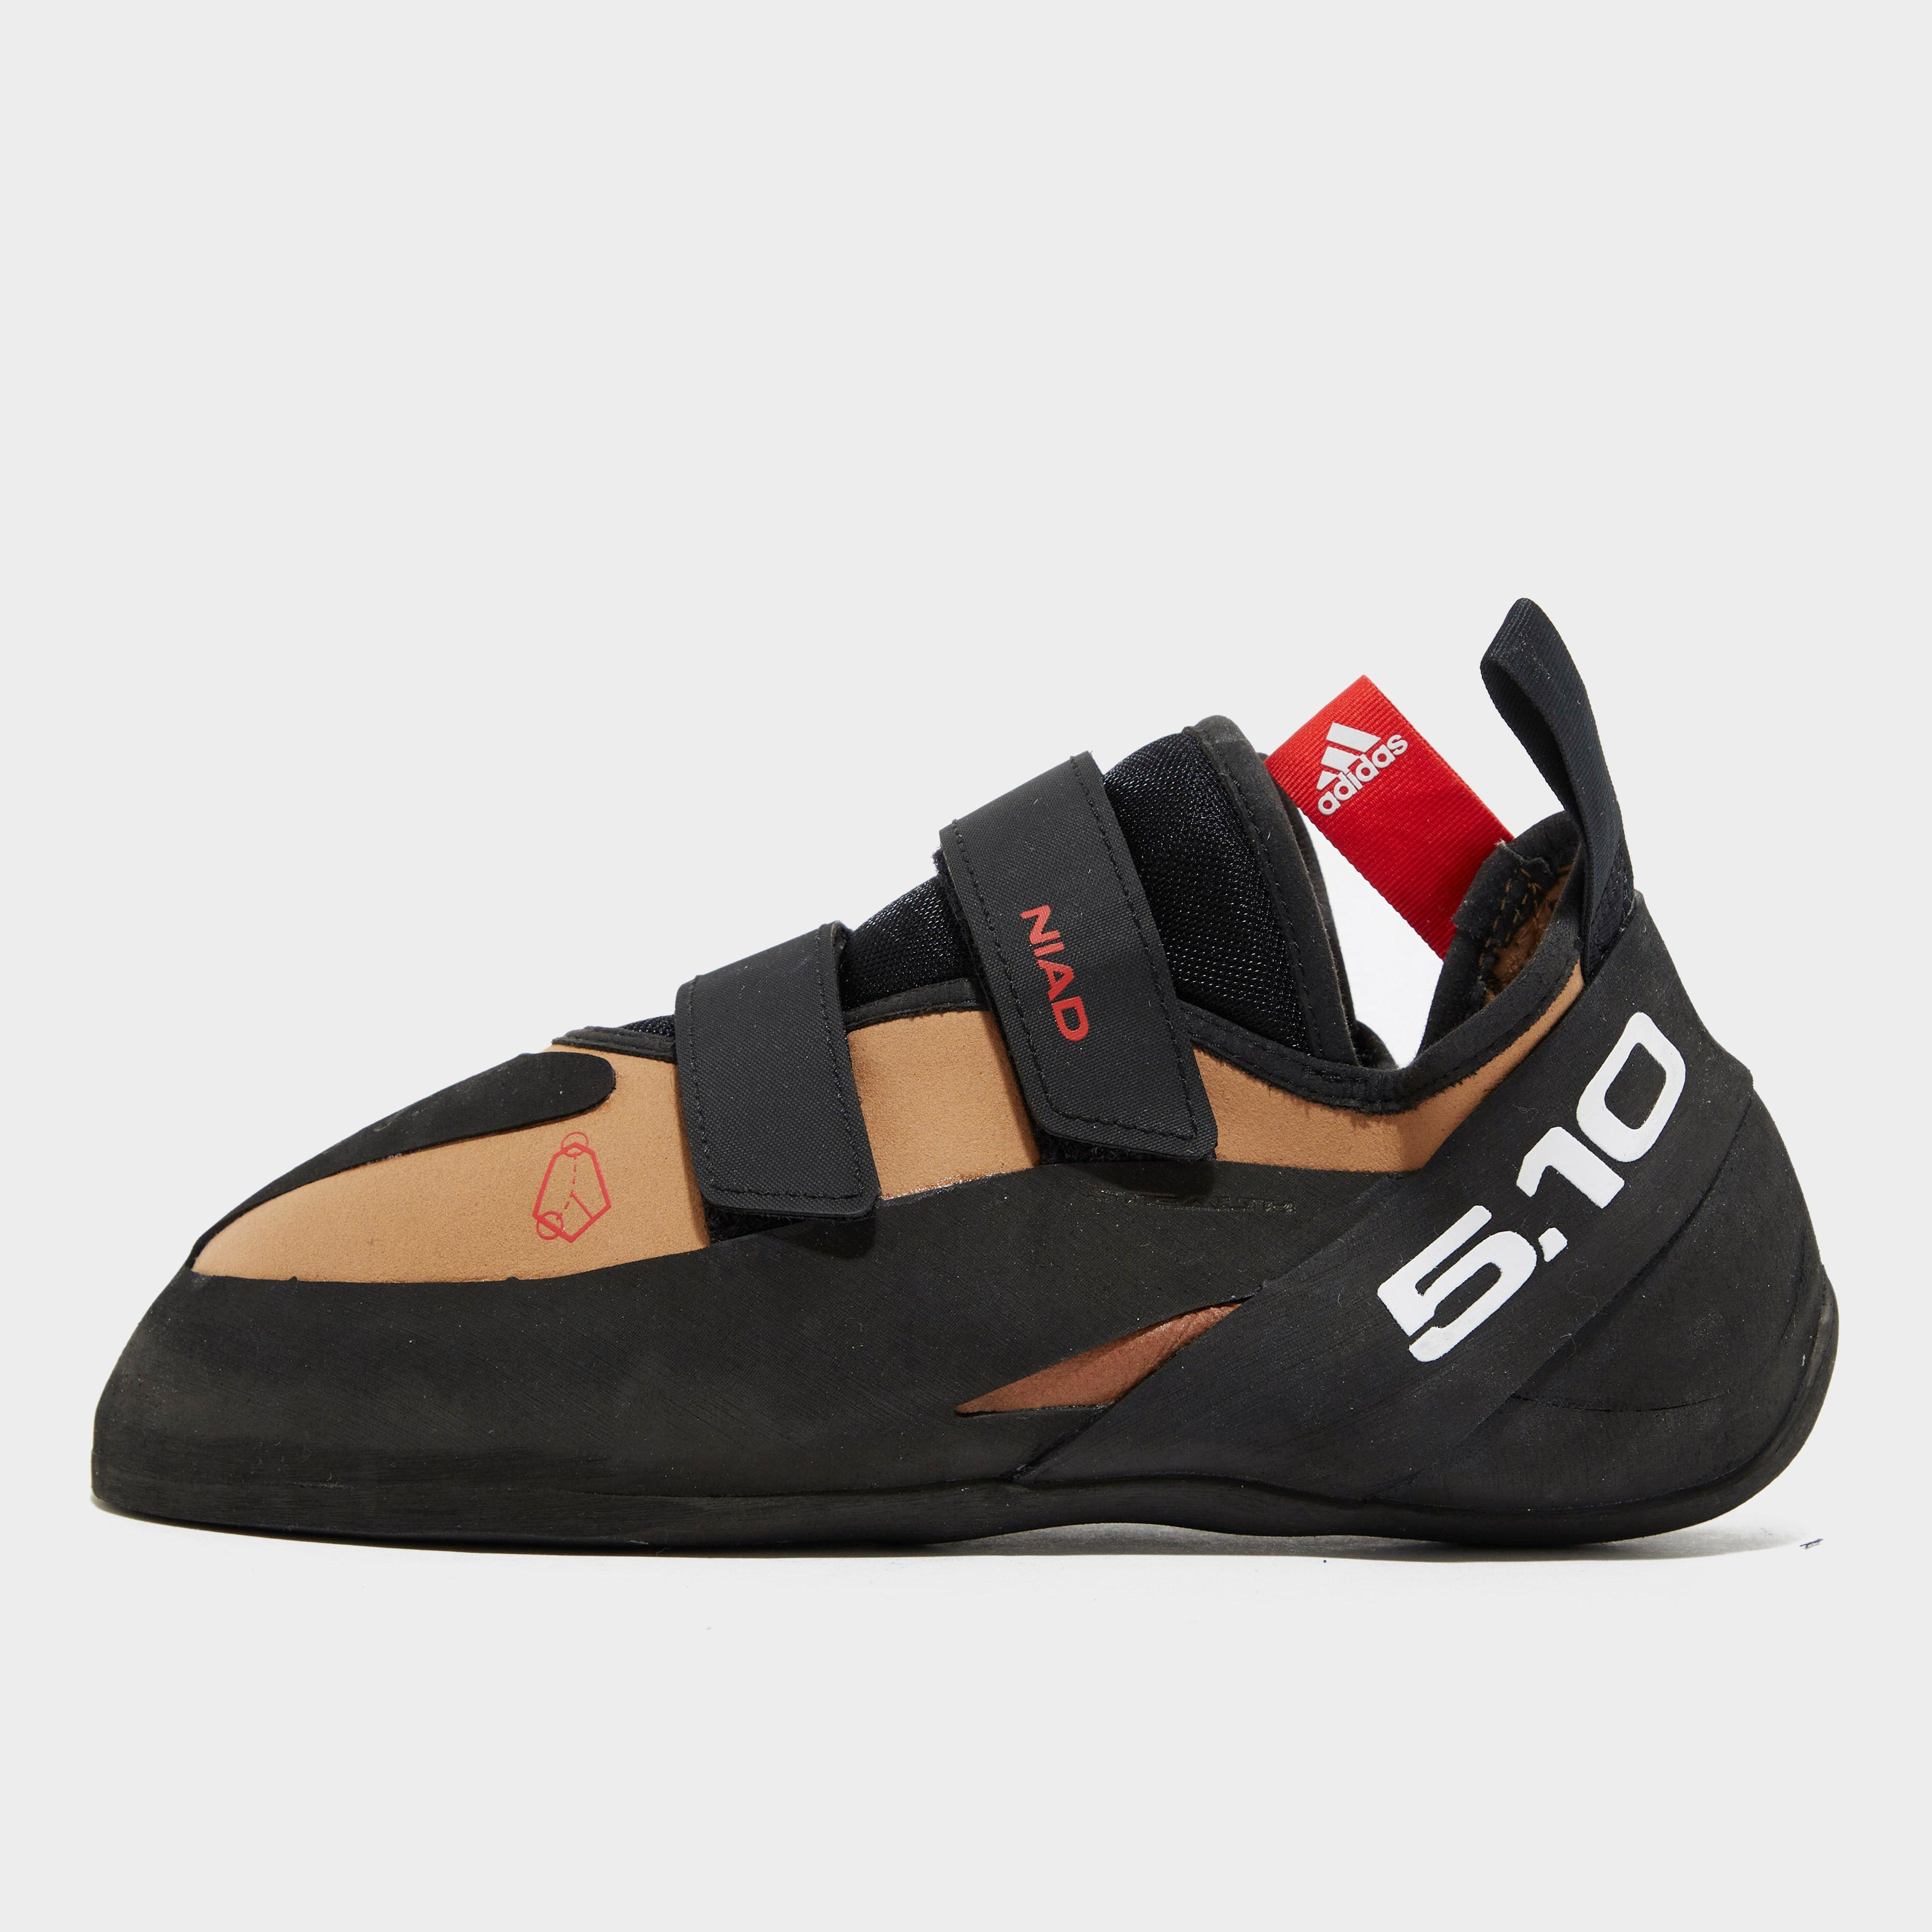 Adidas Five Ten Men's Niad Vcs Climbing Shoe - Black, Black